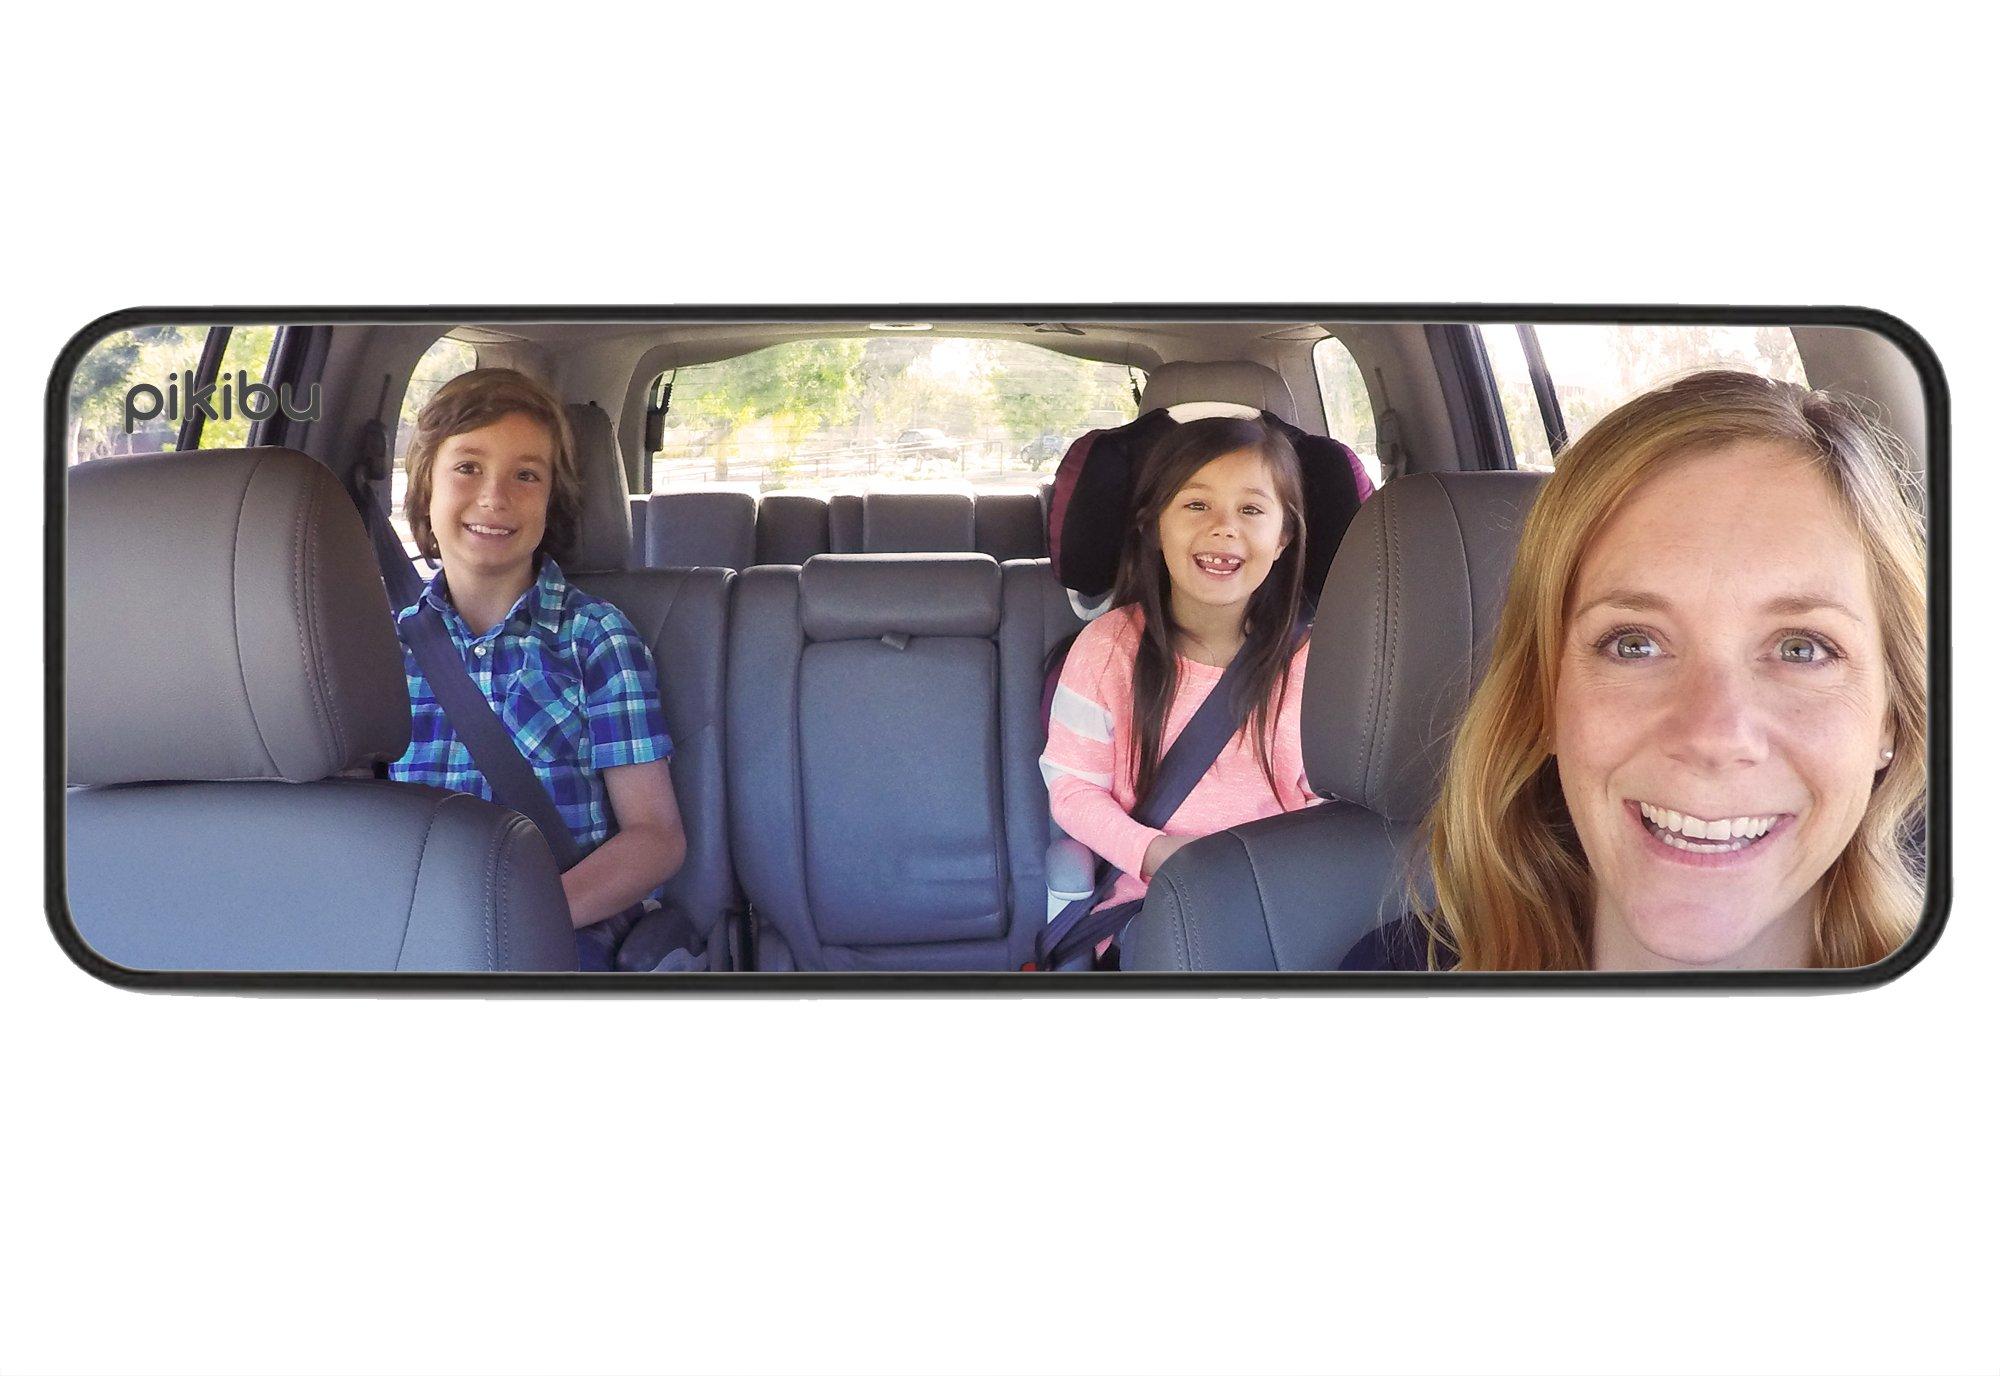 Pikibu 180-Degree View High Definition Clarity Baby Car Mirror, Black by Pikibu